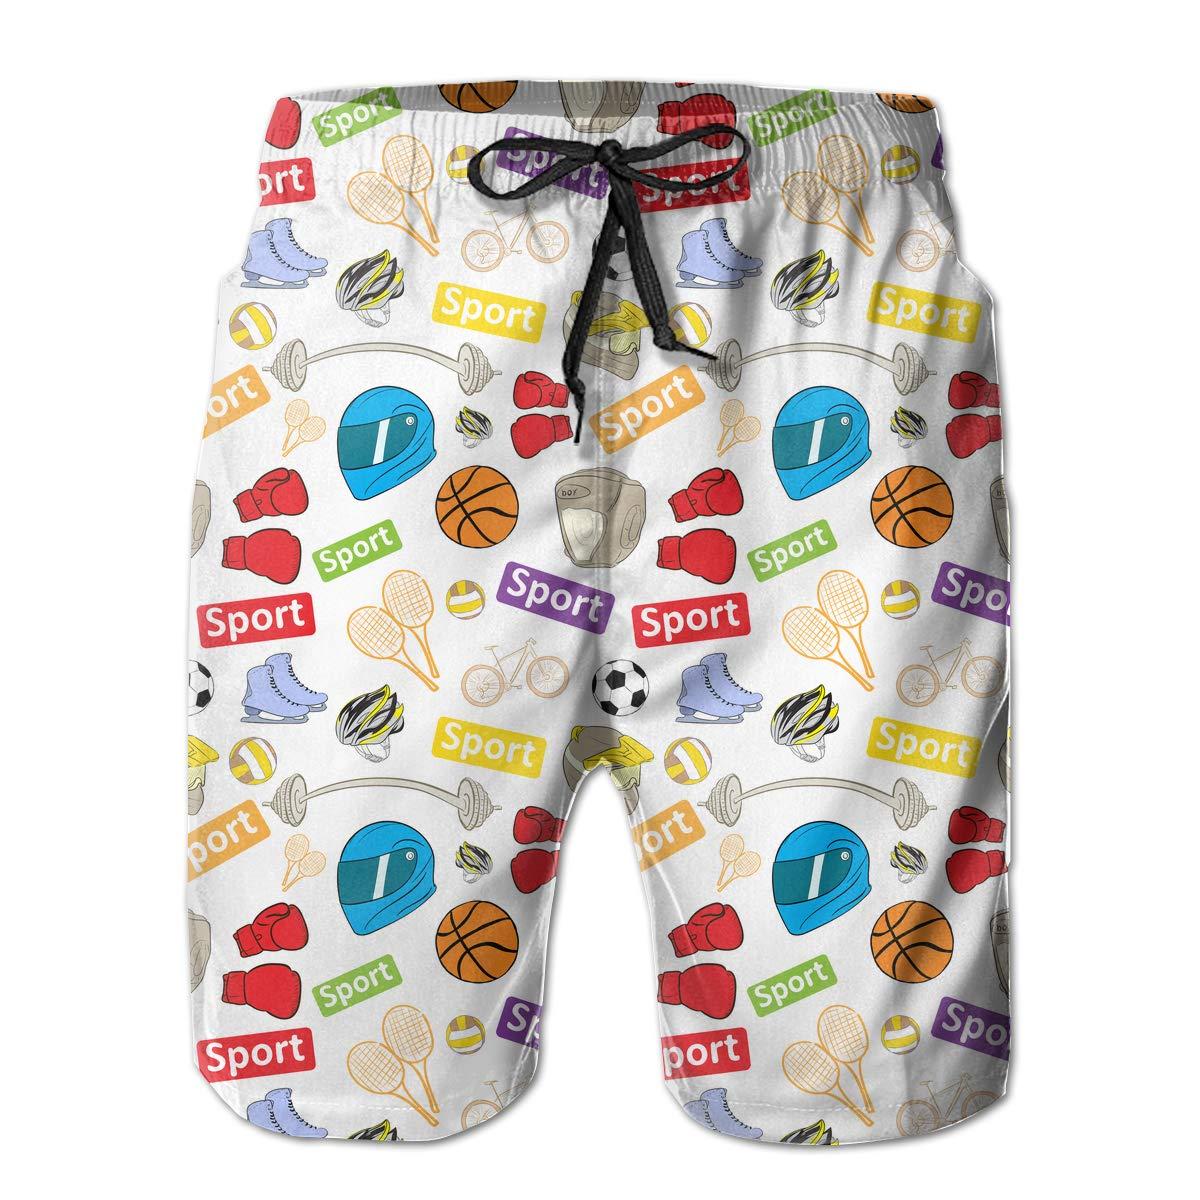 Shakumen Sports Texture Mens Beach Shorts Breathable Athletic Shorts with 3 Pockets